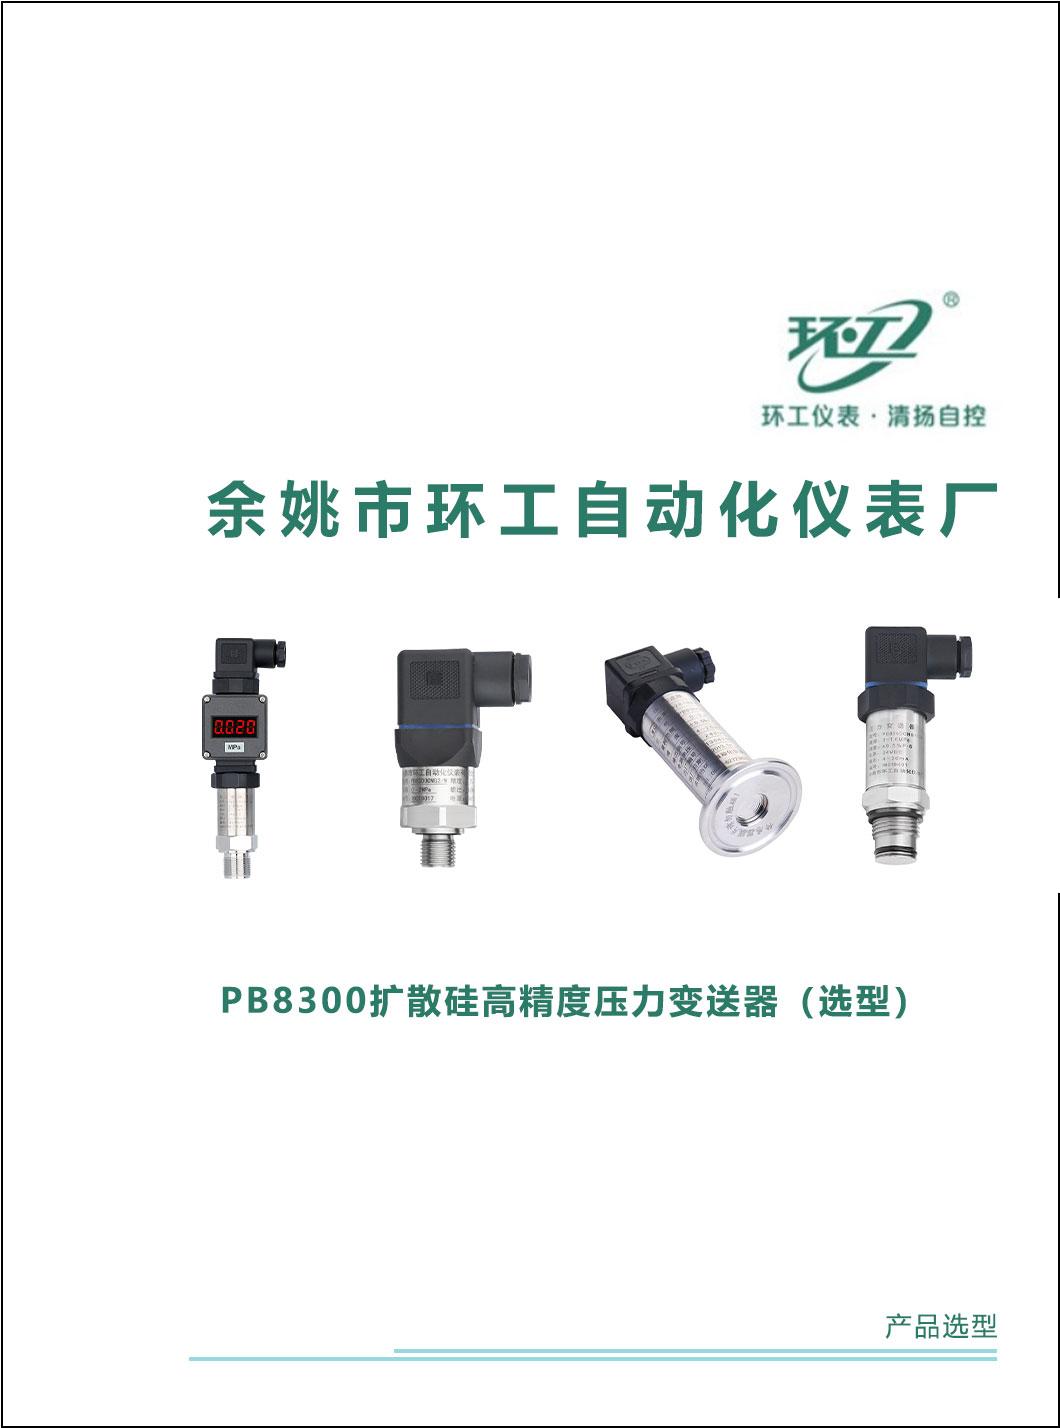 PB8300扩散硅高精度压力变送器-环工仪表-清扬自控